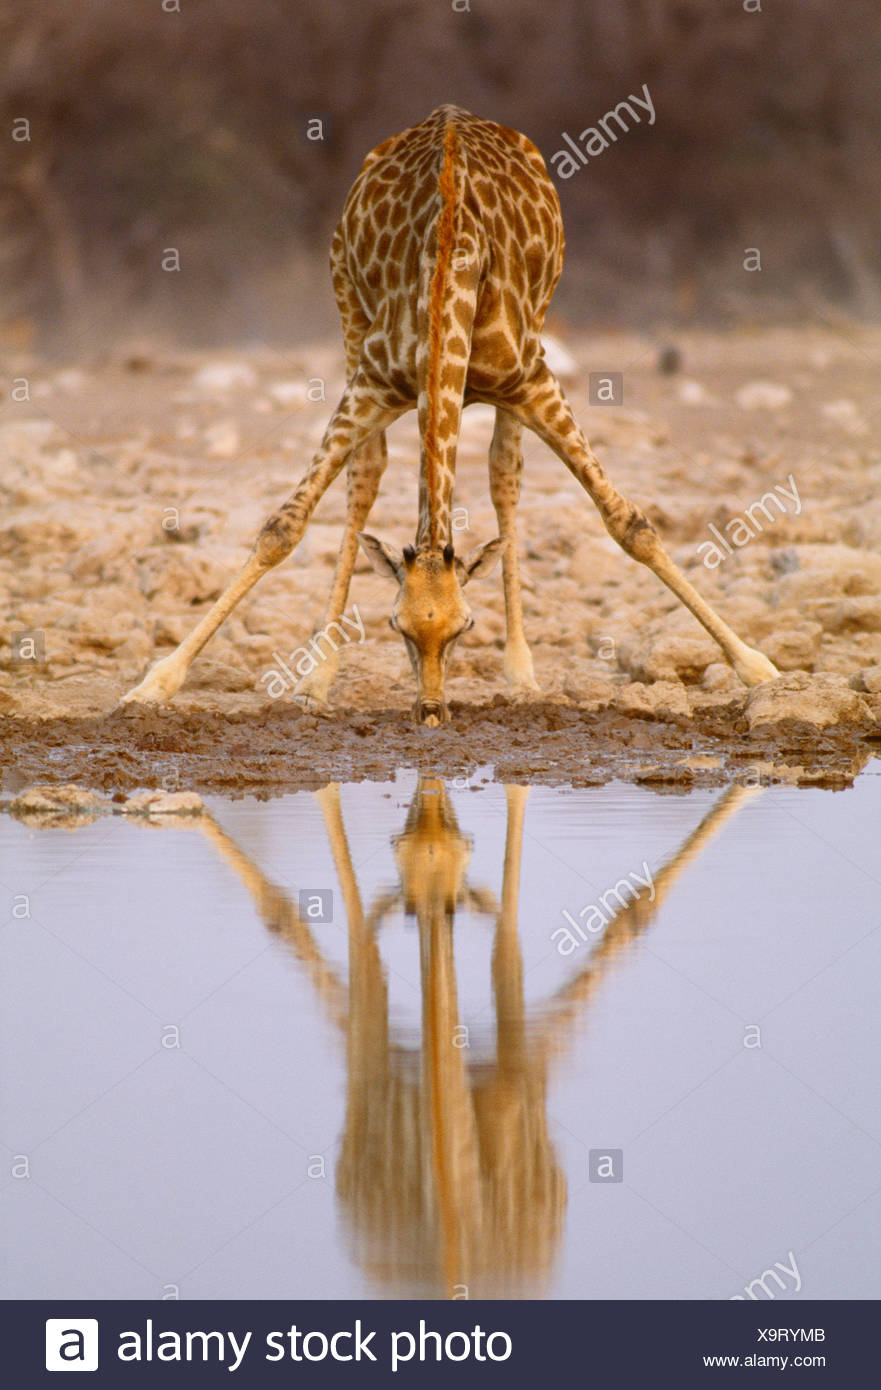 South African giraffe, il Parco Nazionale di Etosha, Namibia Immagini Stock